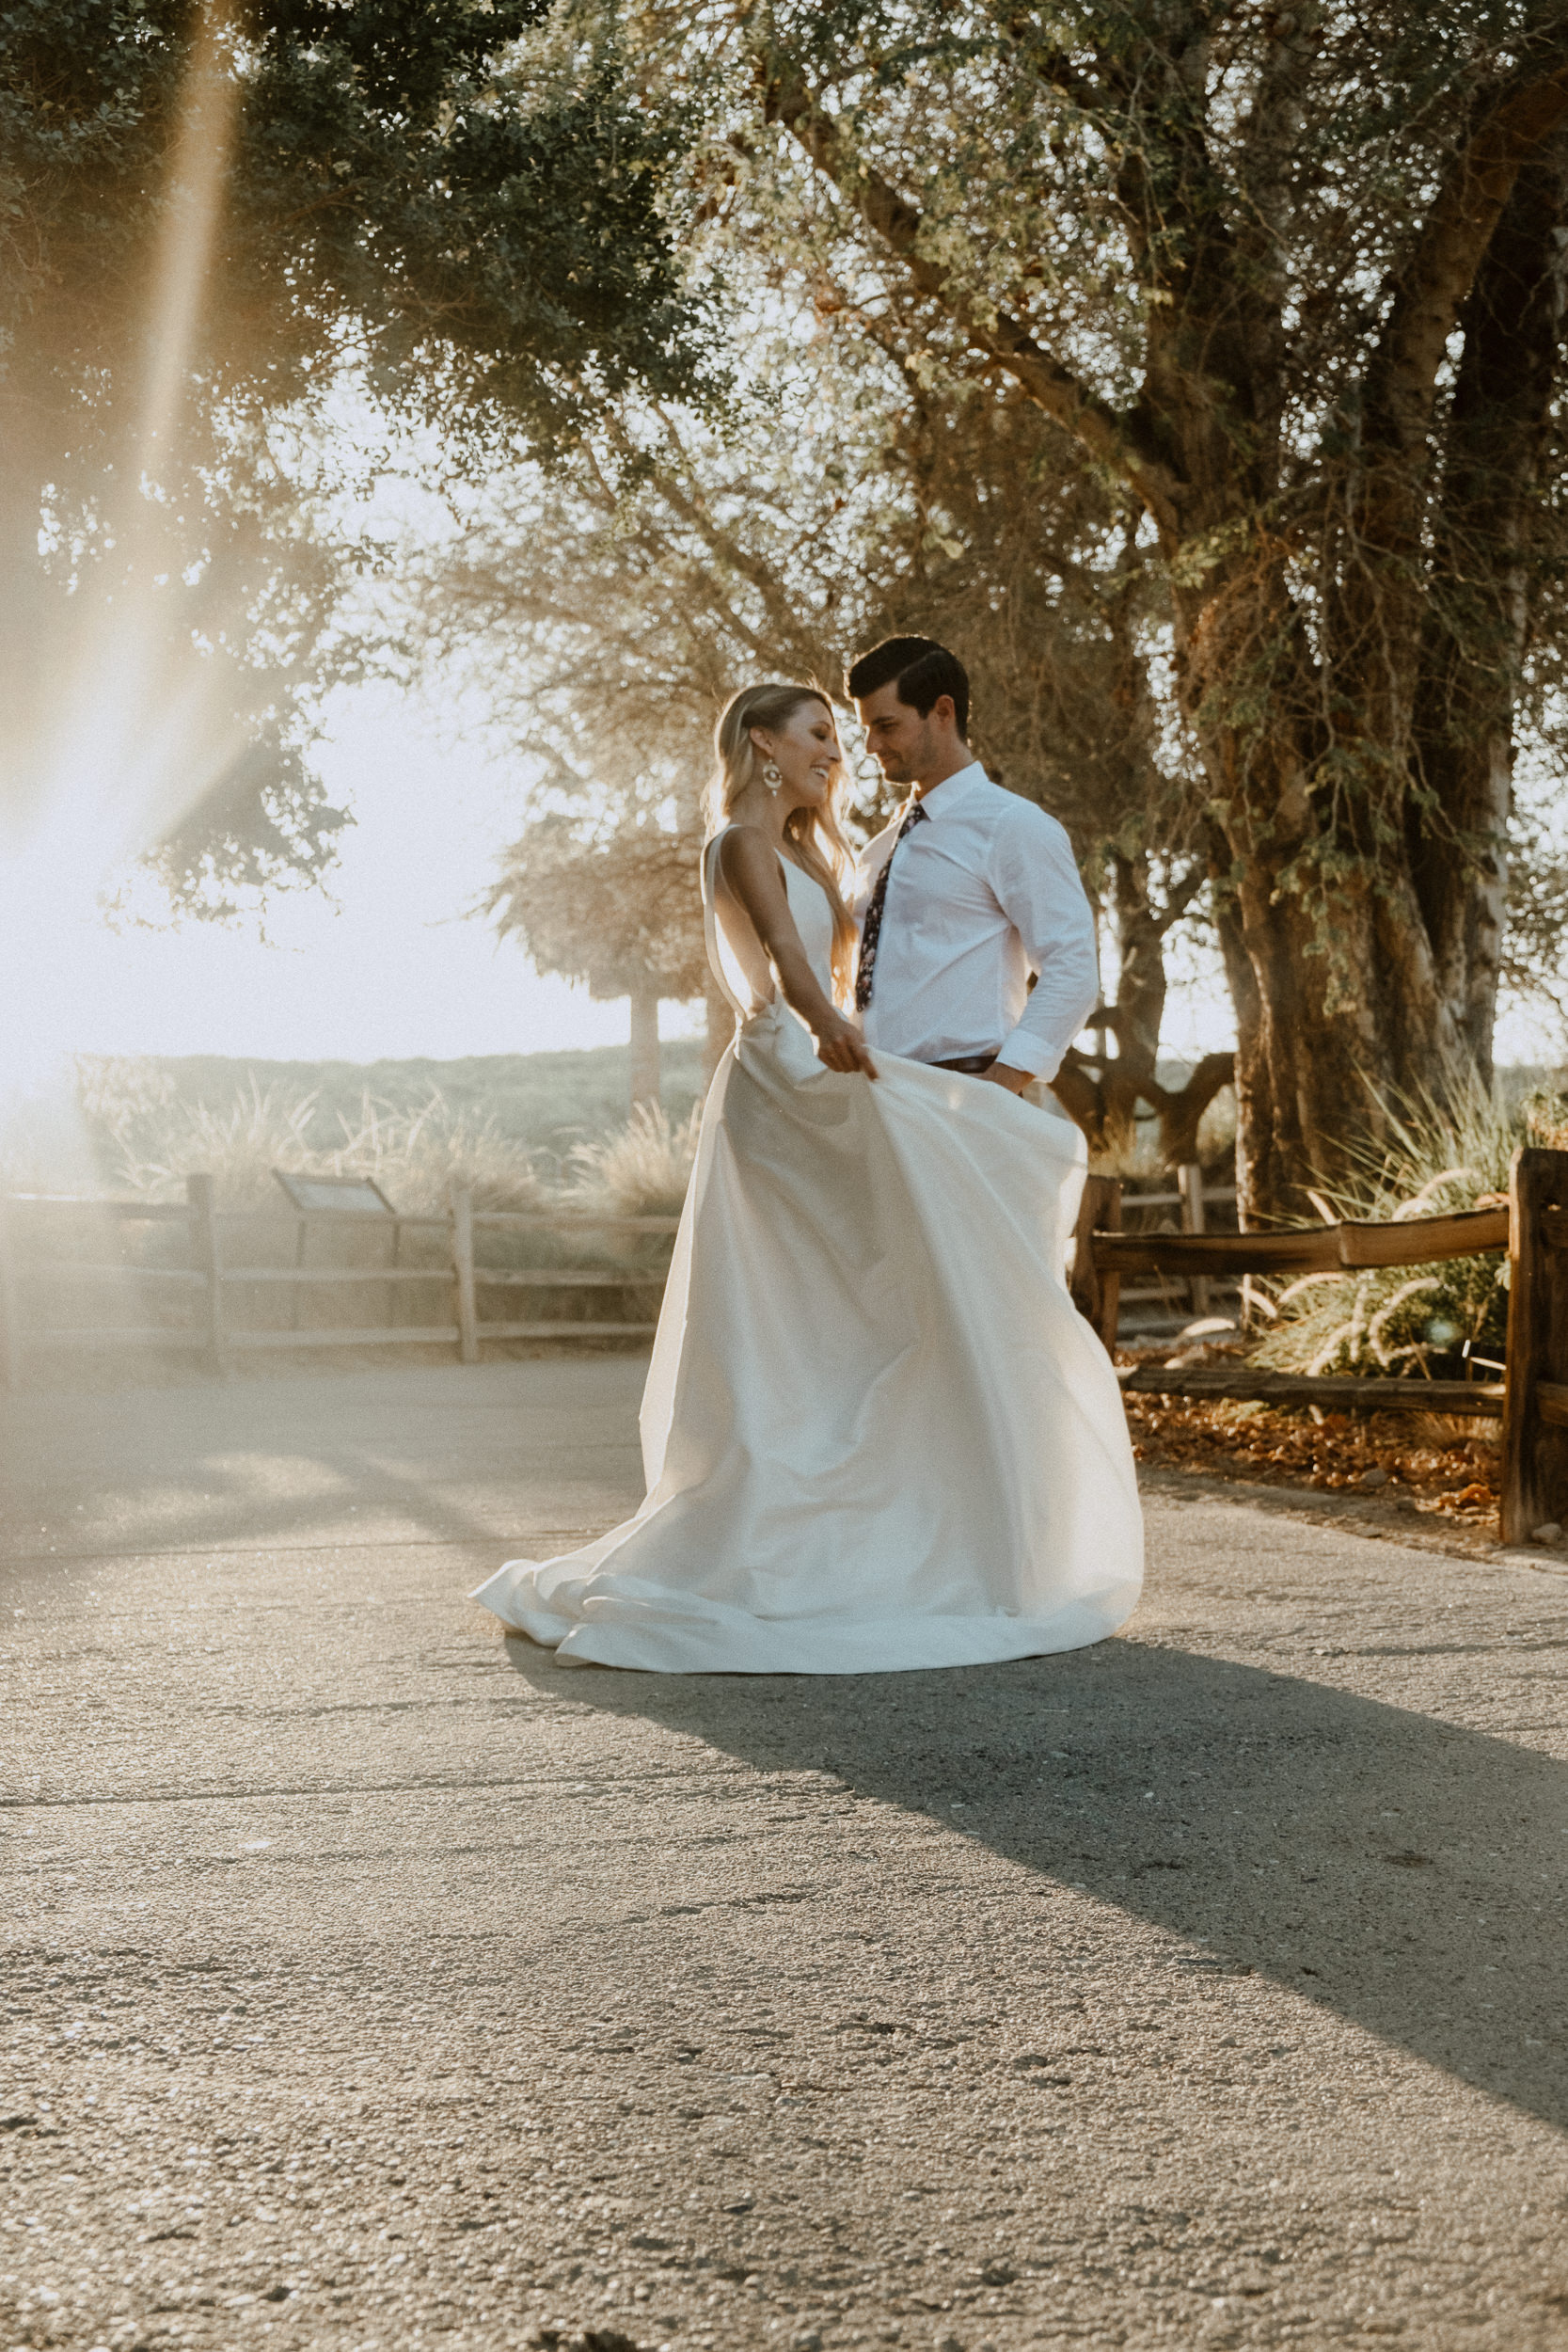 sChelsie + Chris - The Desert Shootout Wedding Romantics at The Living Desert-37.jpg